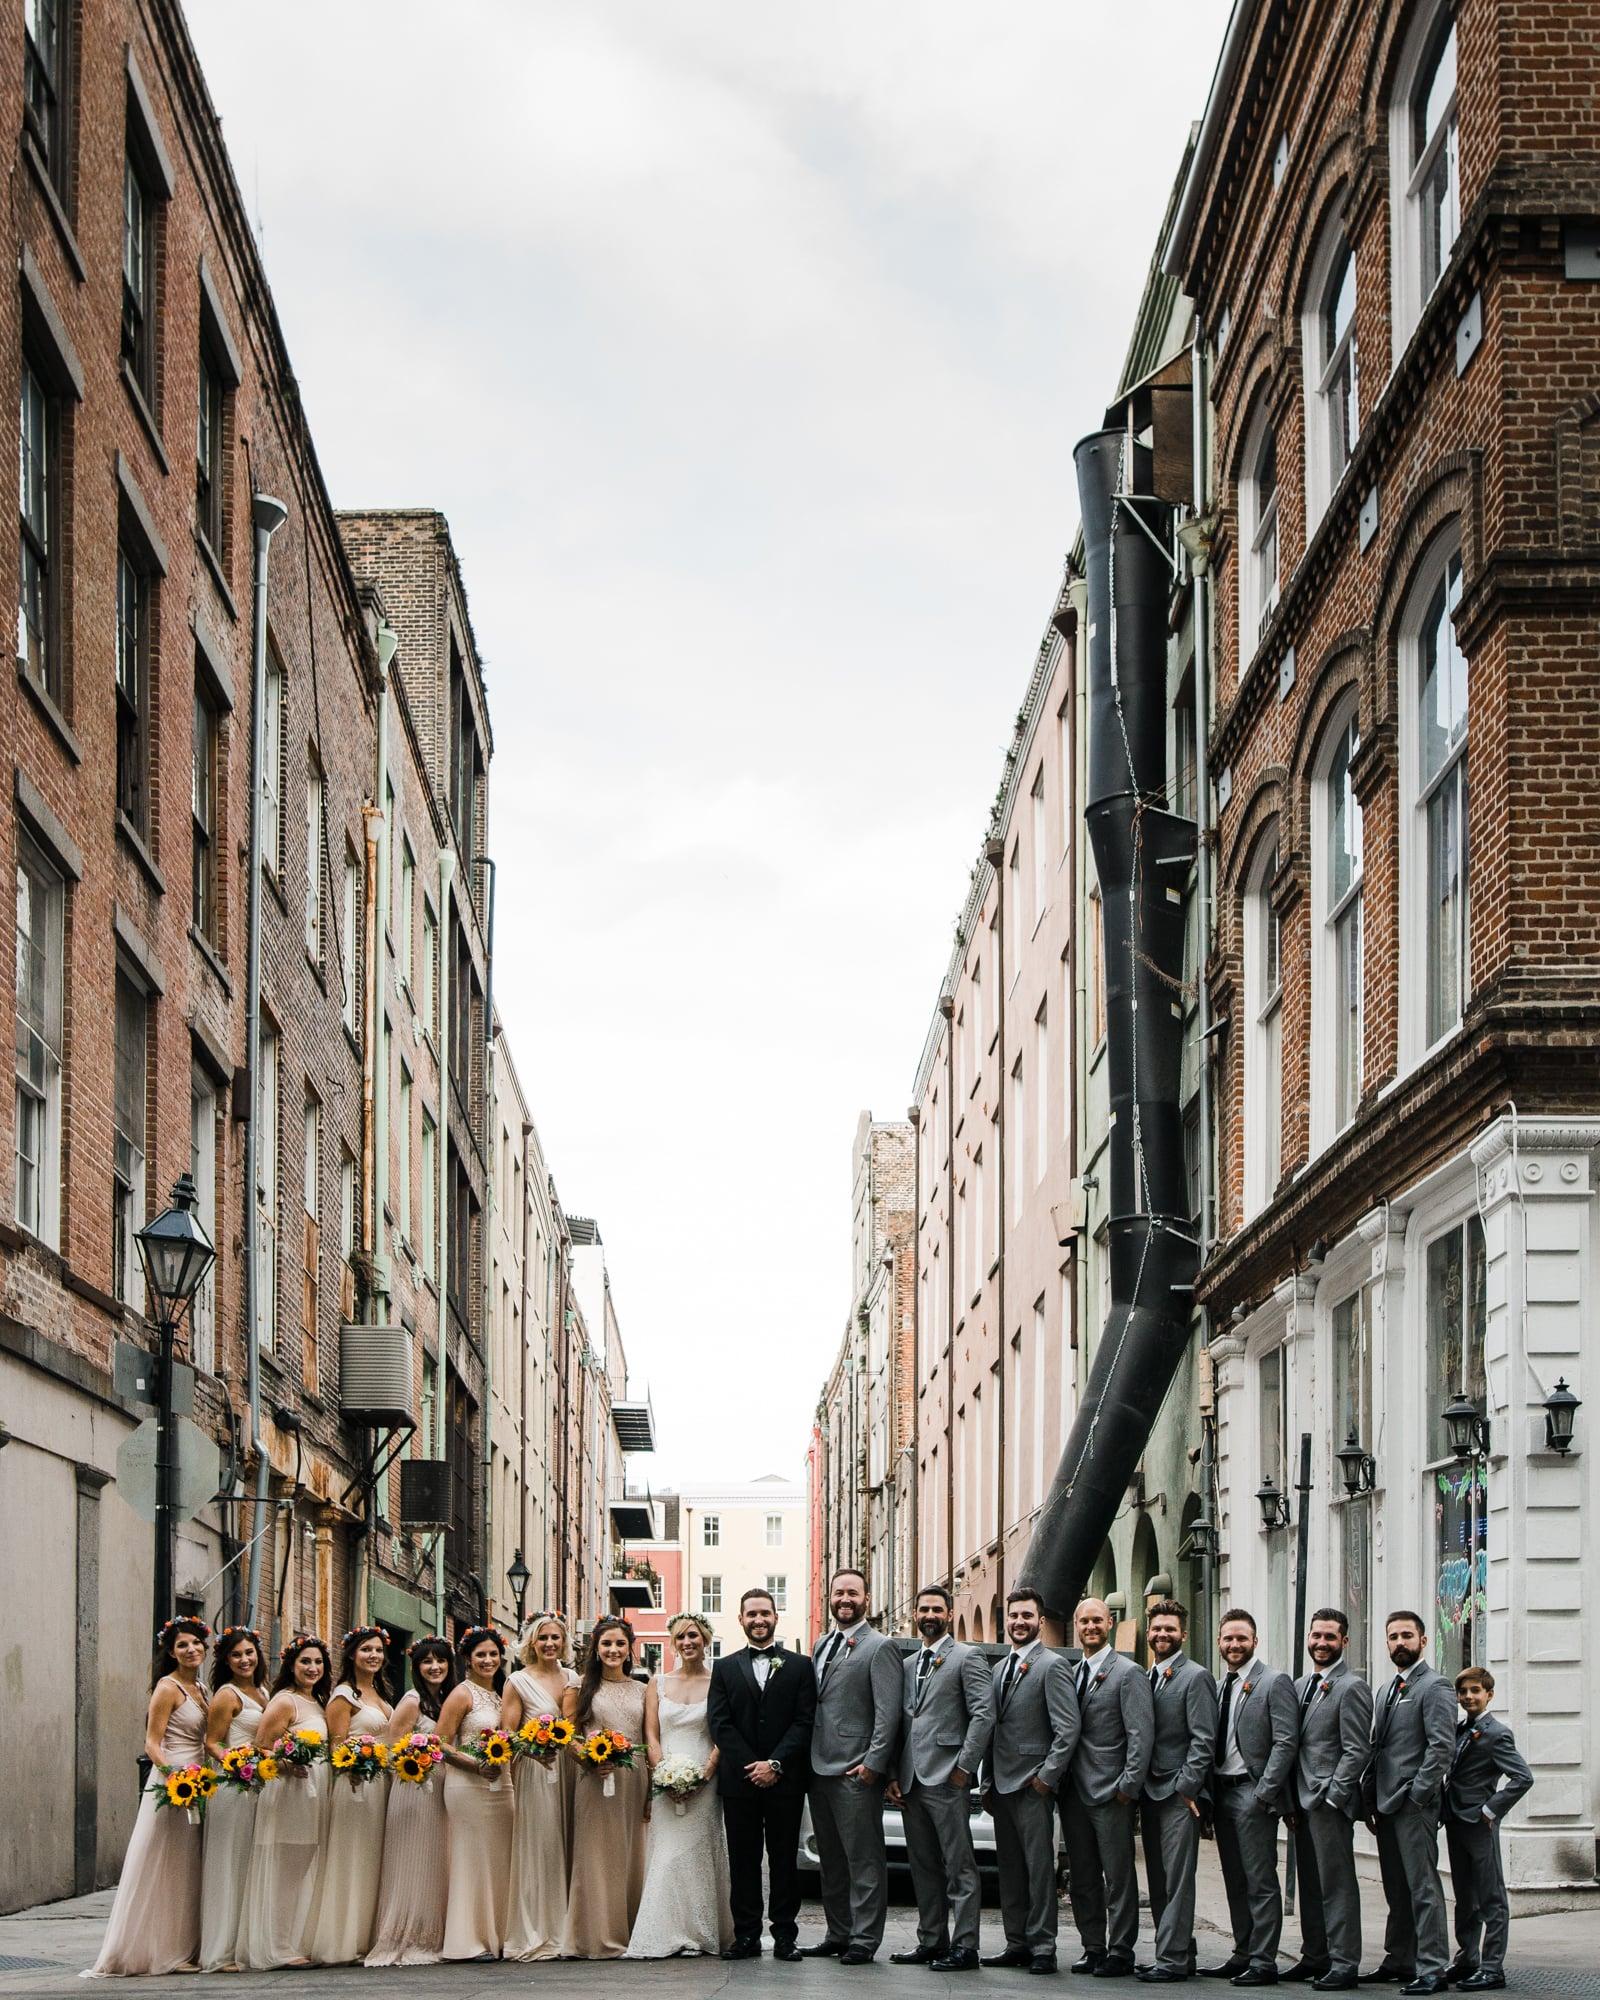 ©Isaiah & Taylor Photography - The Elms Mansion Wedding - New Orleans, Louisiana-58.jpg